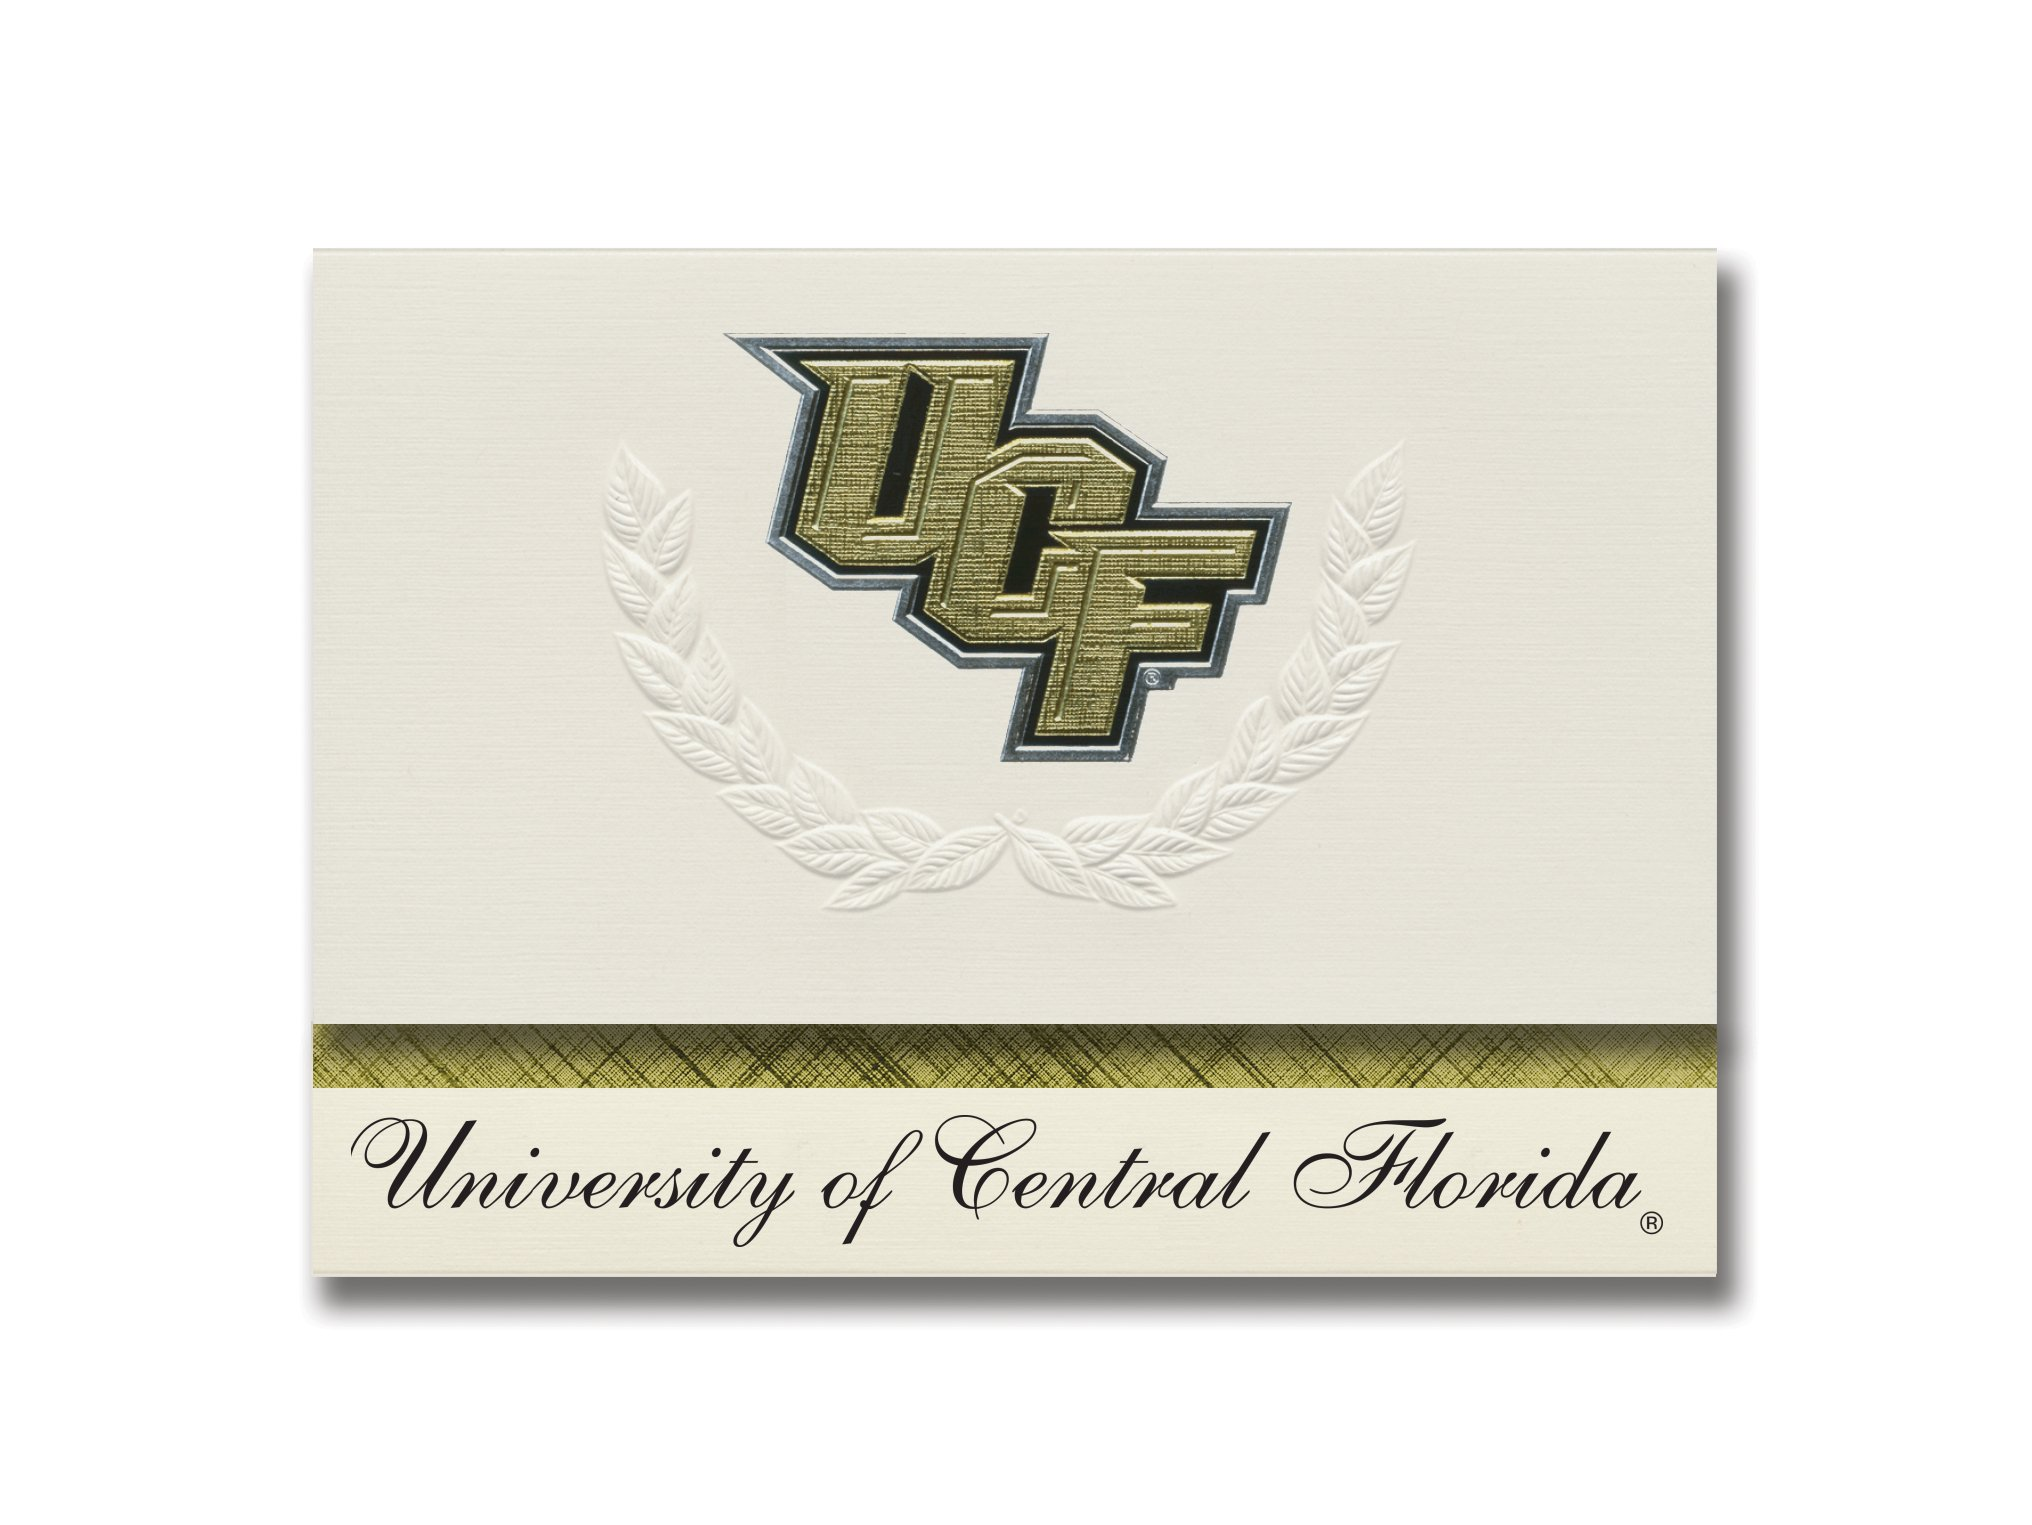 Signature Announcements University of Central Florida Graduation Announcements, Platinum style, Elite Pack 20 with U. of Central Florida Logo Foil